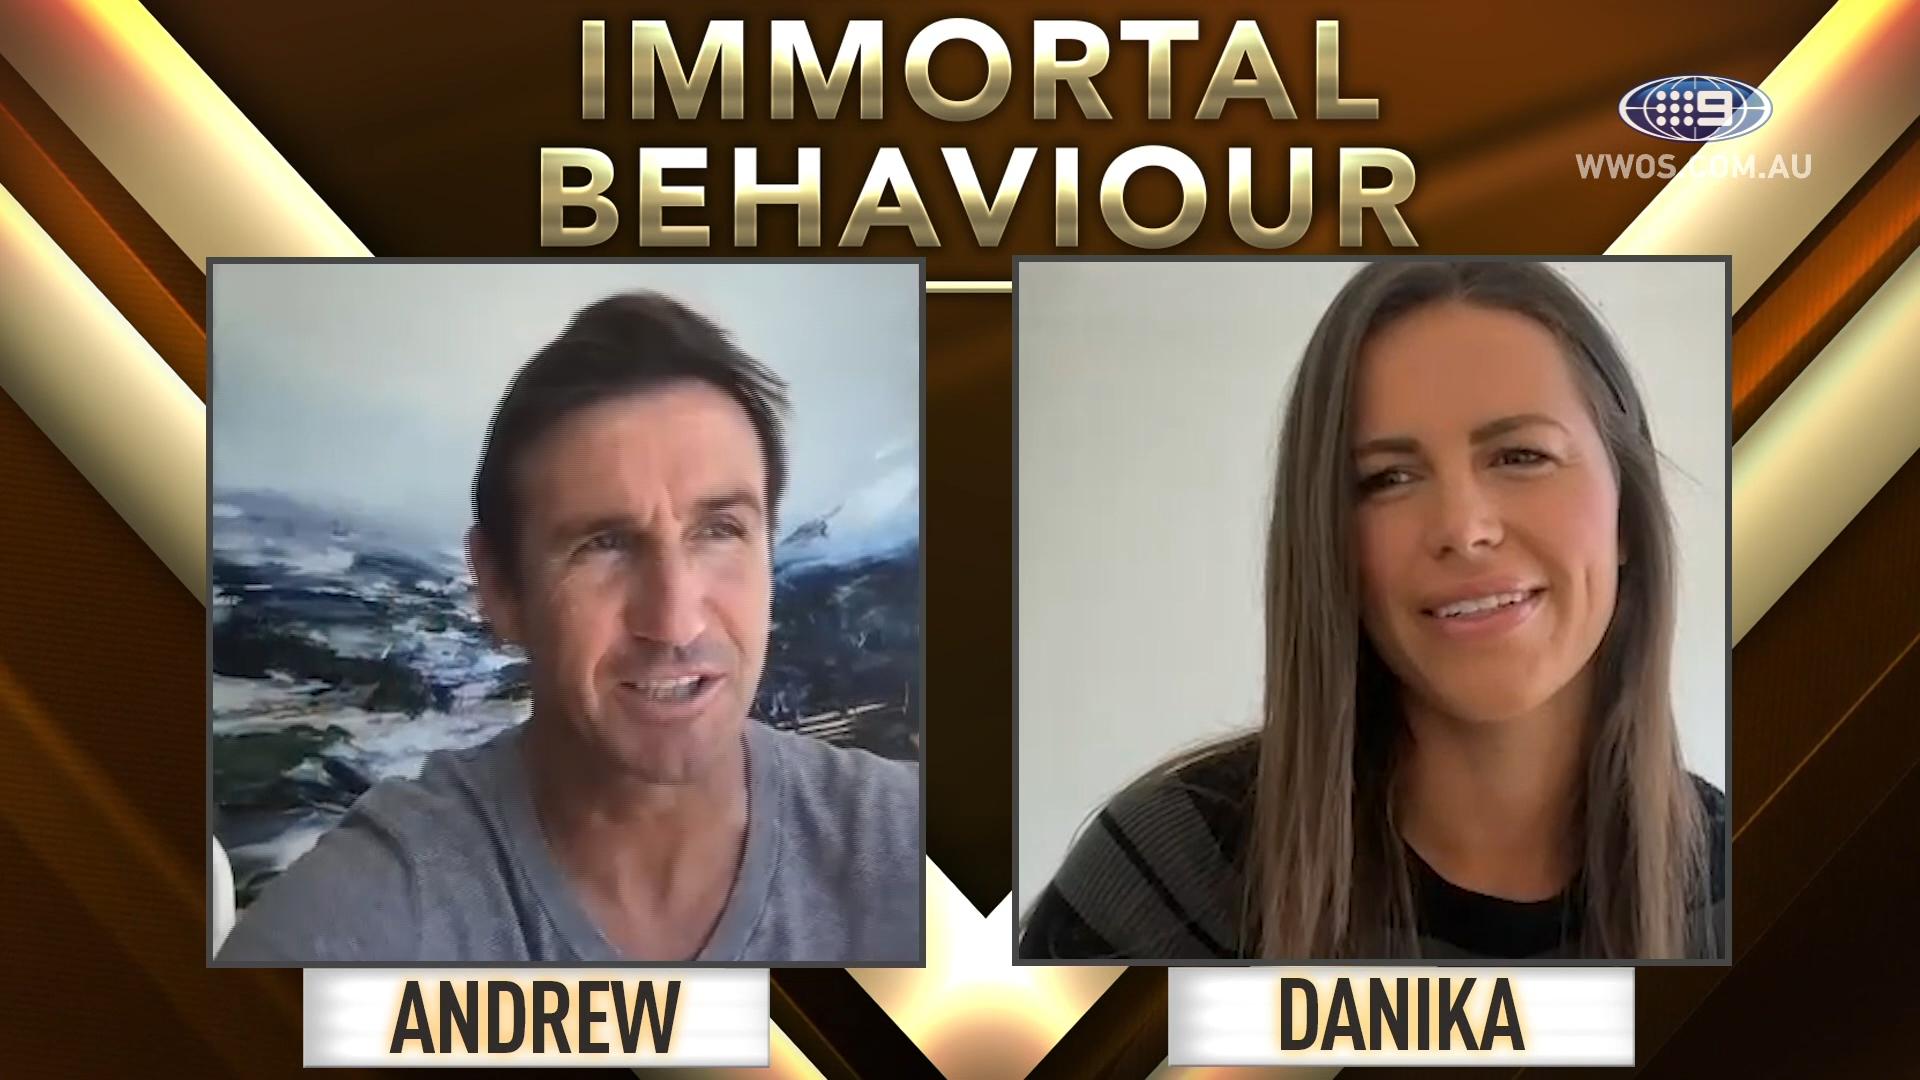 Immortal Behaviour: Joey previews the Preliminary Finals - Finals Week 2